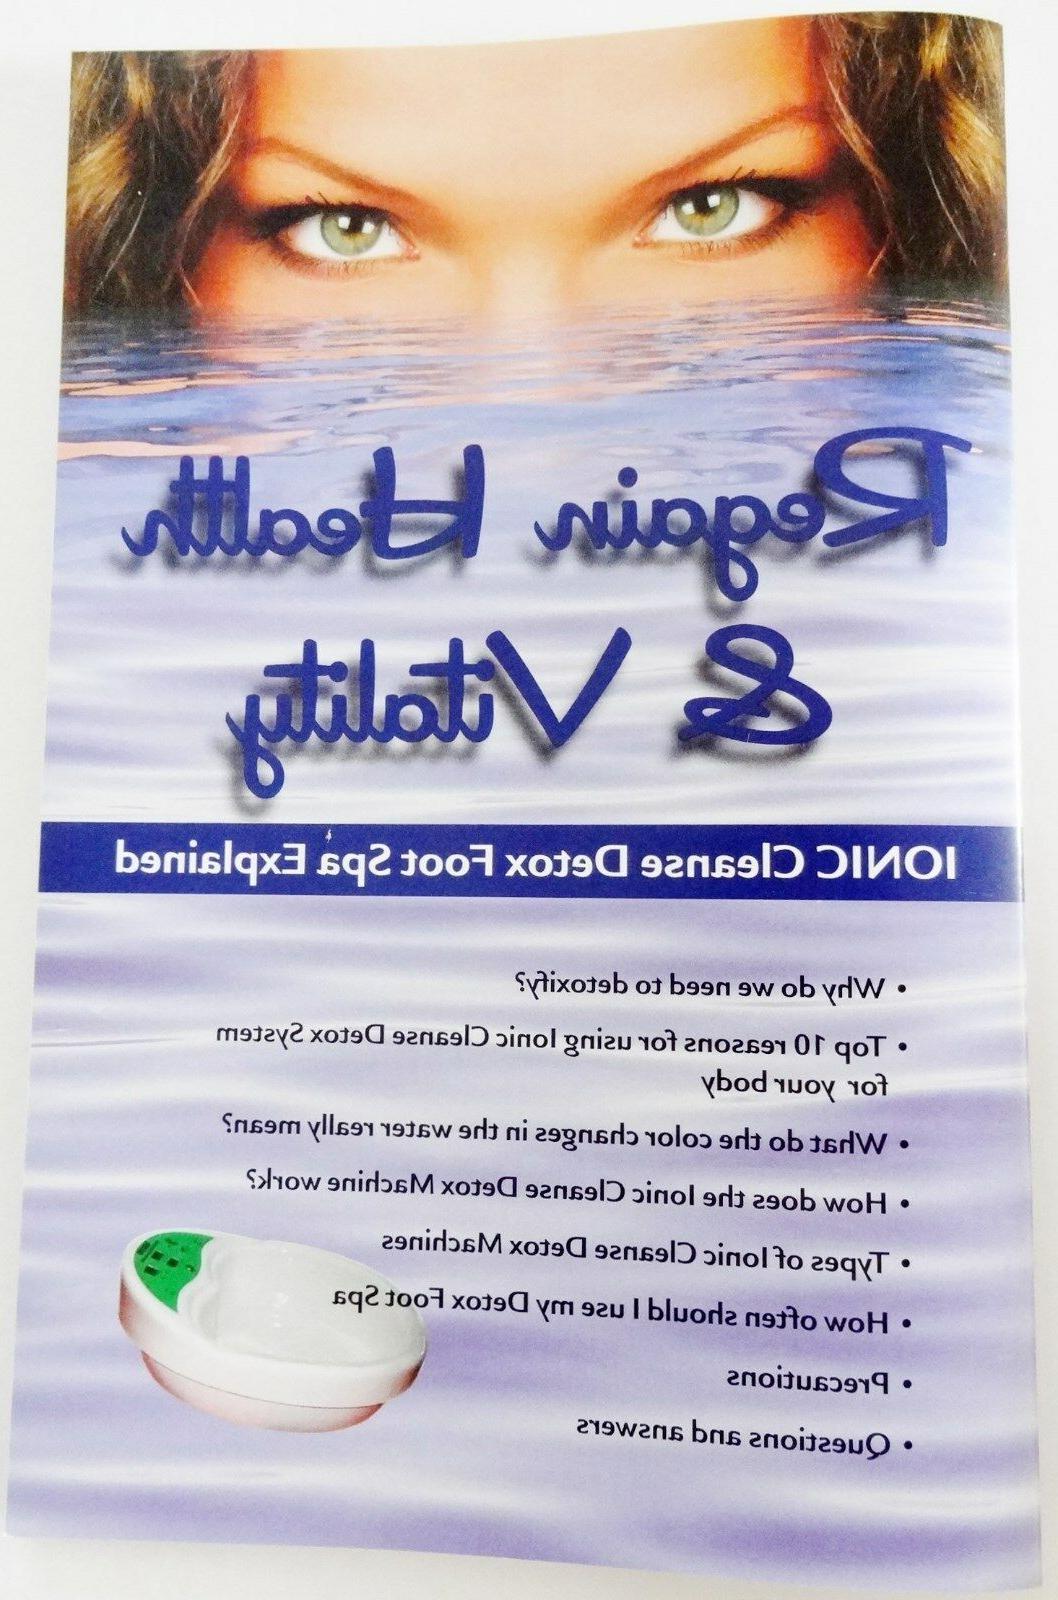 Detox SPA Automatic Ionic Foot Bath Spa 1 YEAR